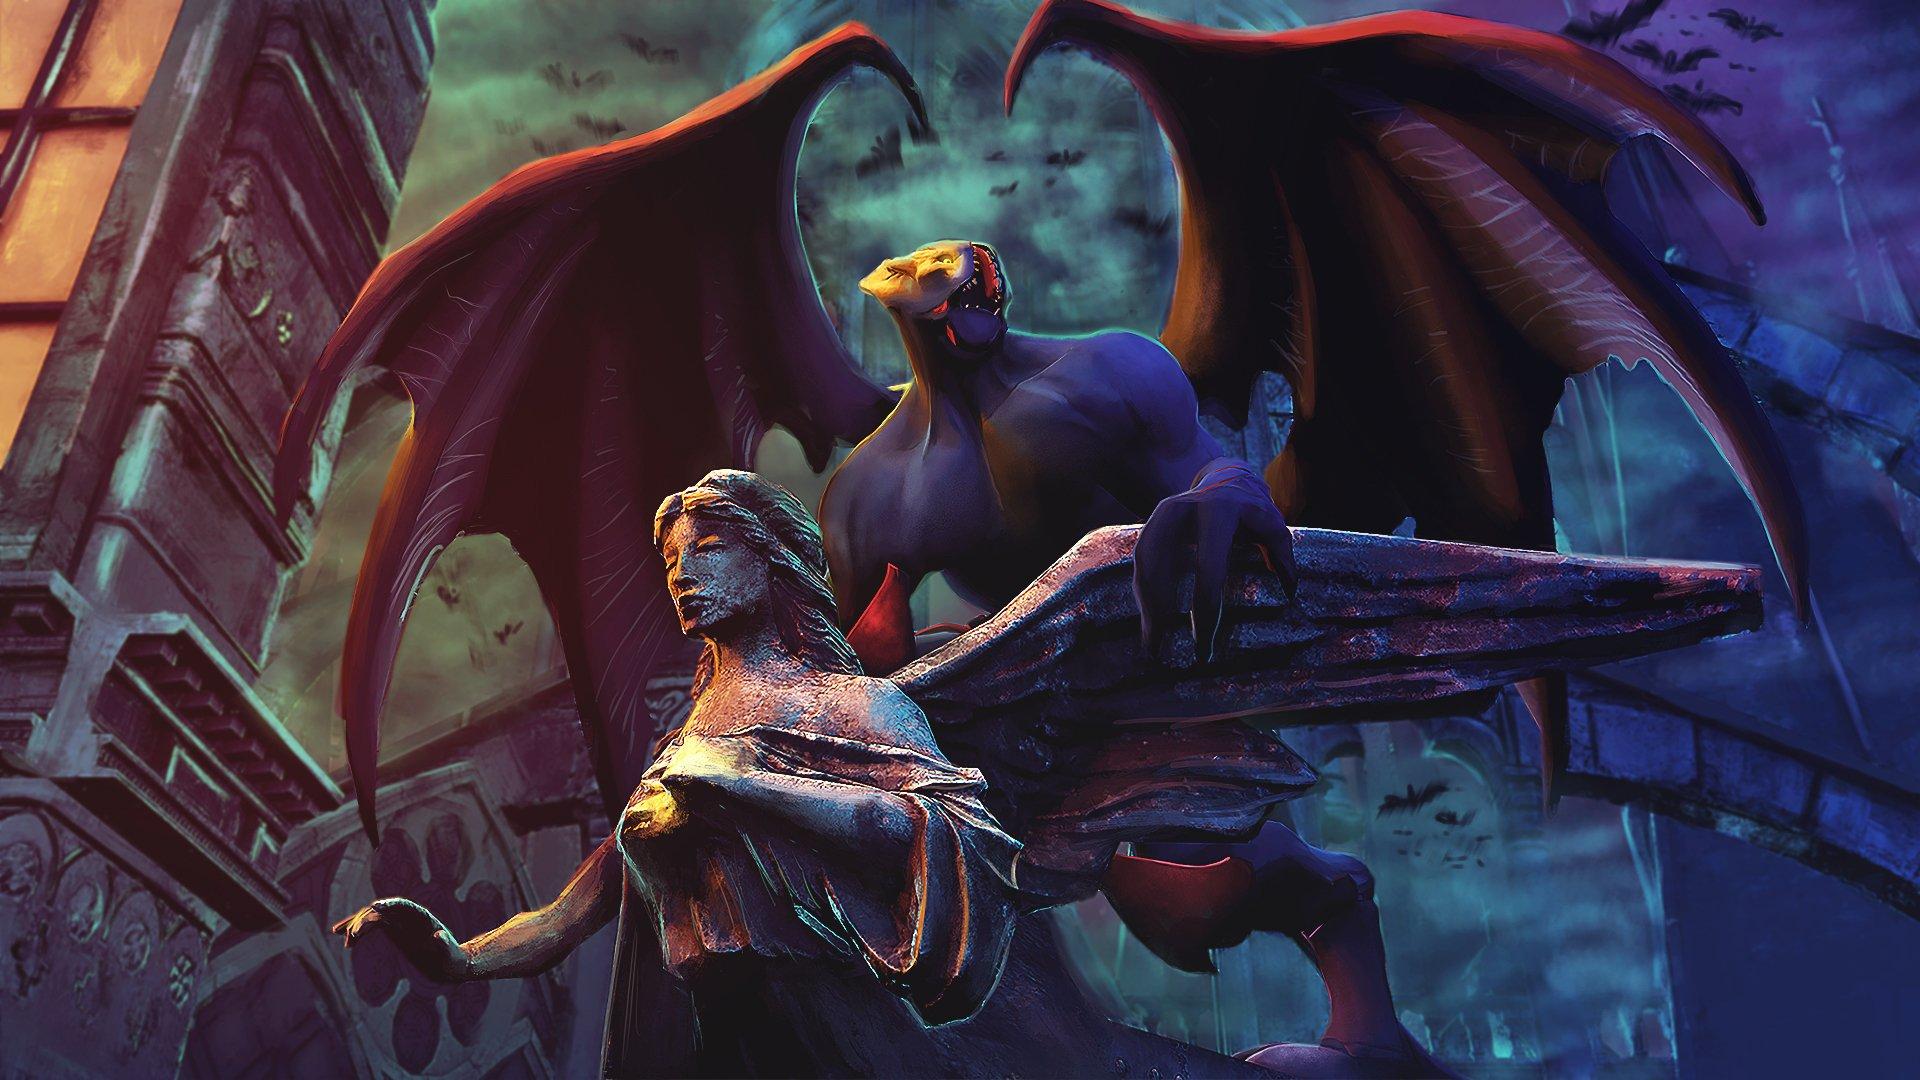 Video Game - DotA 2  Night Stalker (Dota 2) Creature Angel Statue Wings Wallpaper